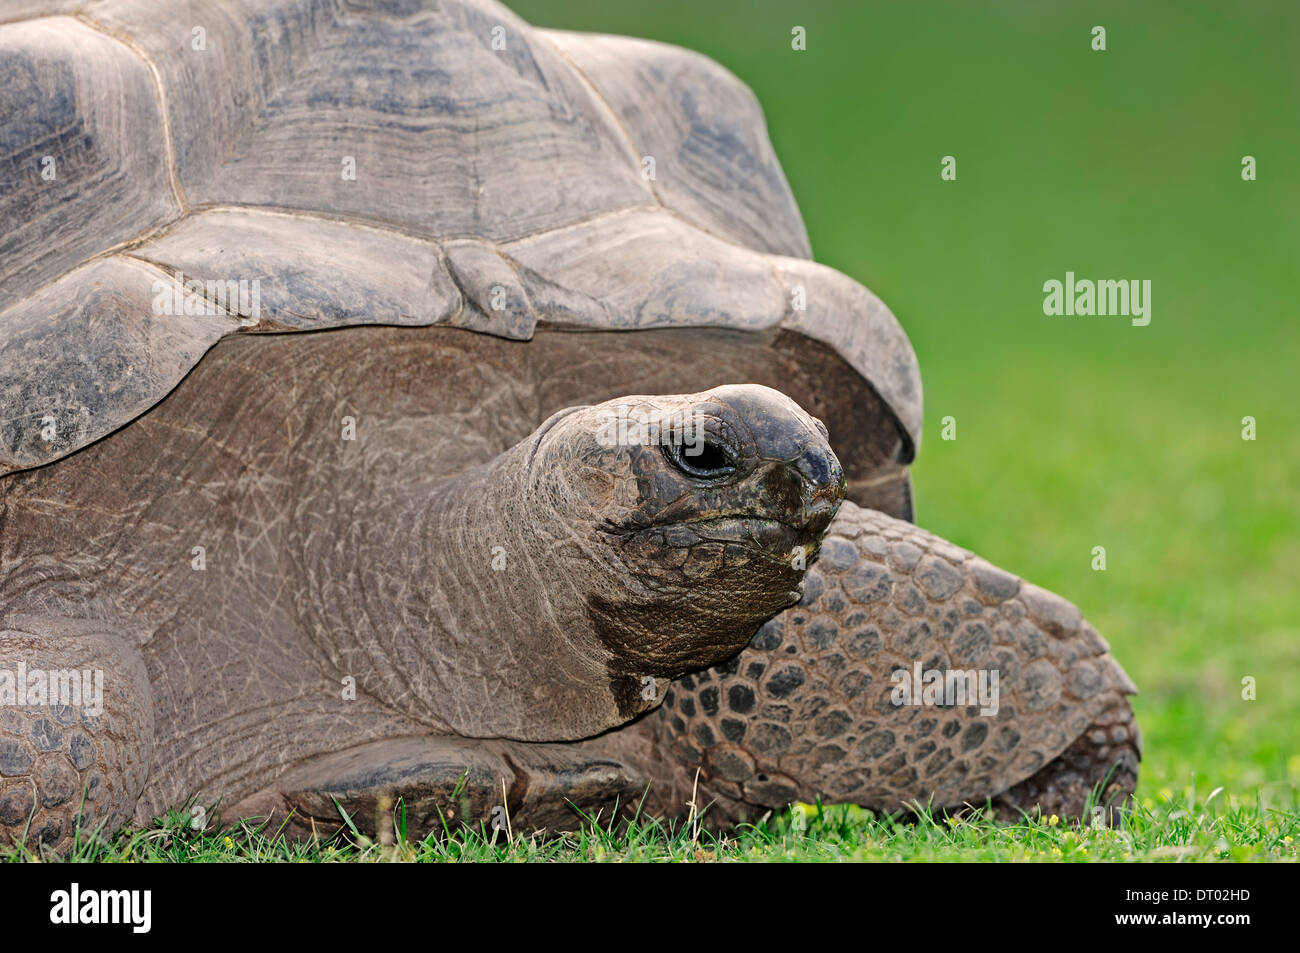 Aldabra Giant Tortoise (Aldabrachelys gigantea, Geochelone gigantea, Dipsochelys elephantina, Dipsochelys dussumieri) - Stock Image